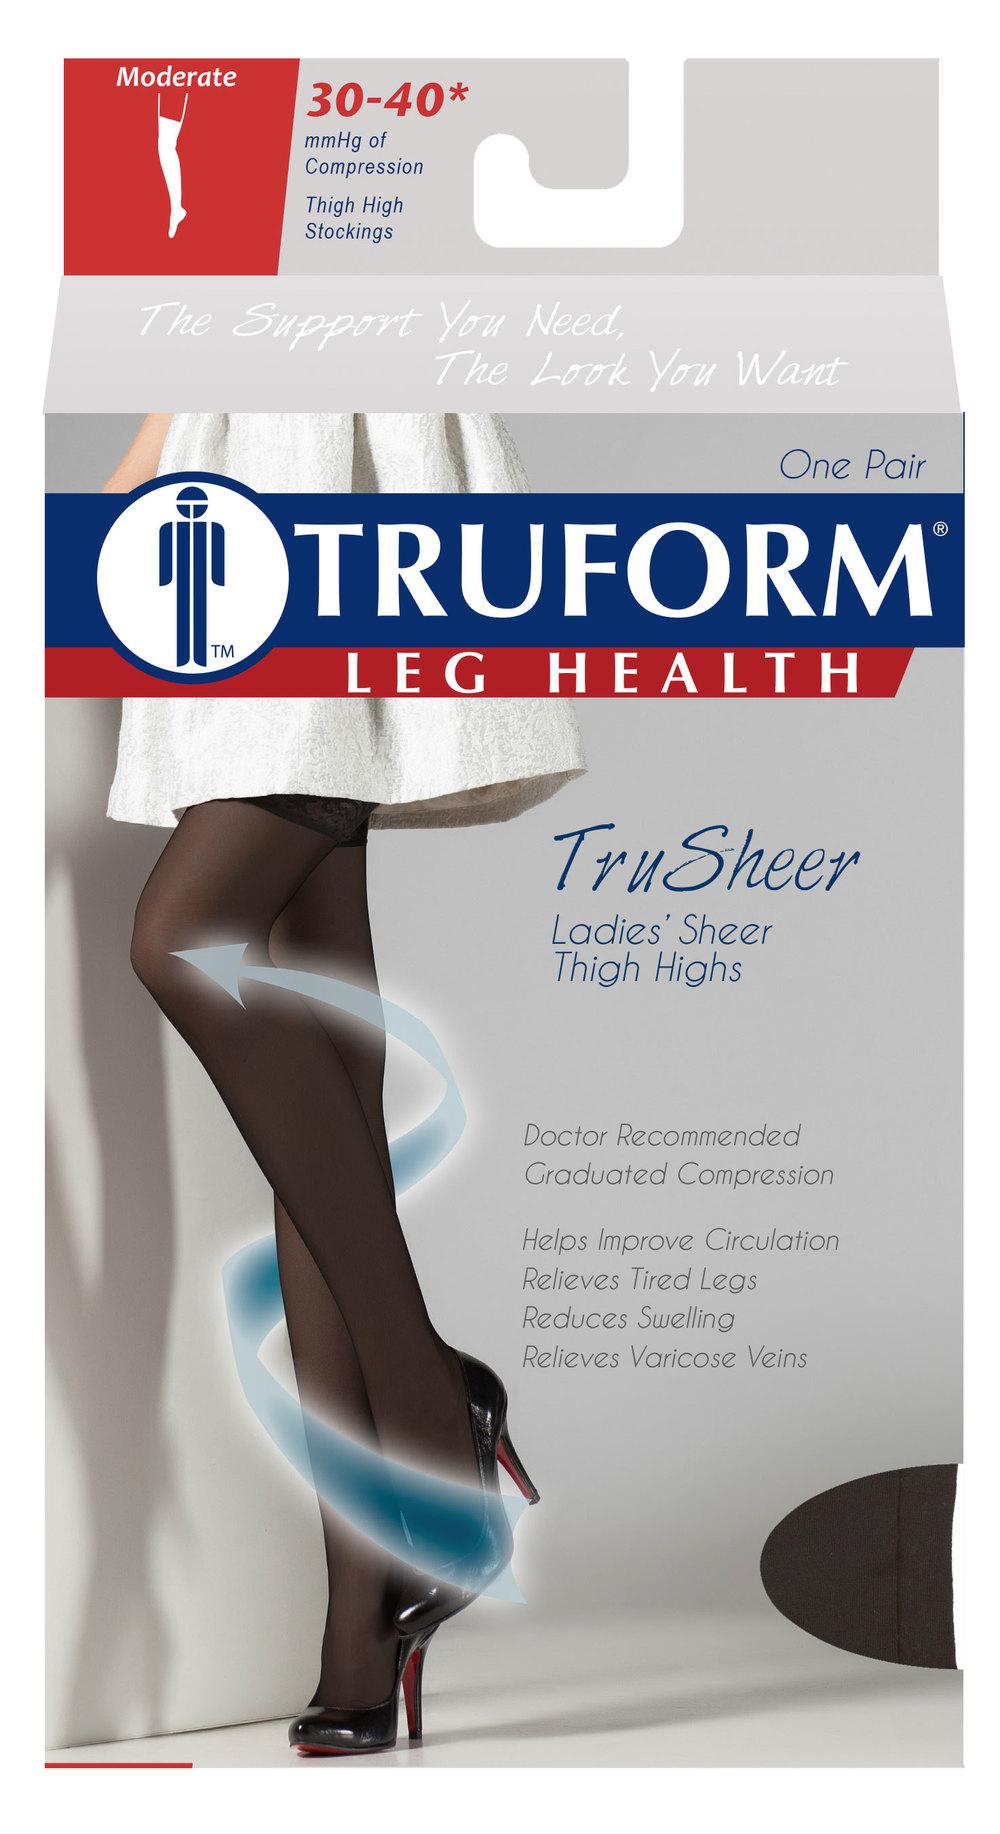 Truform, 0254, 30-40 mmHG, TRUSheer, Thigh High, Package